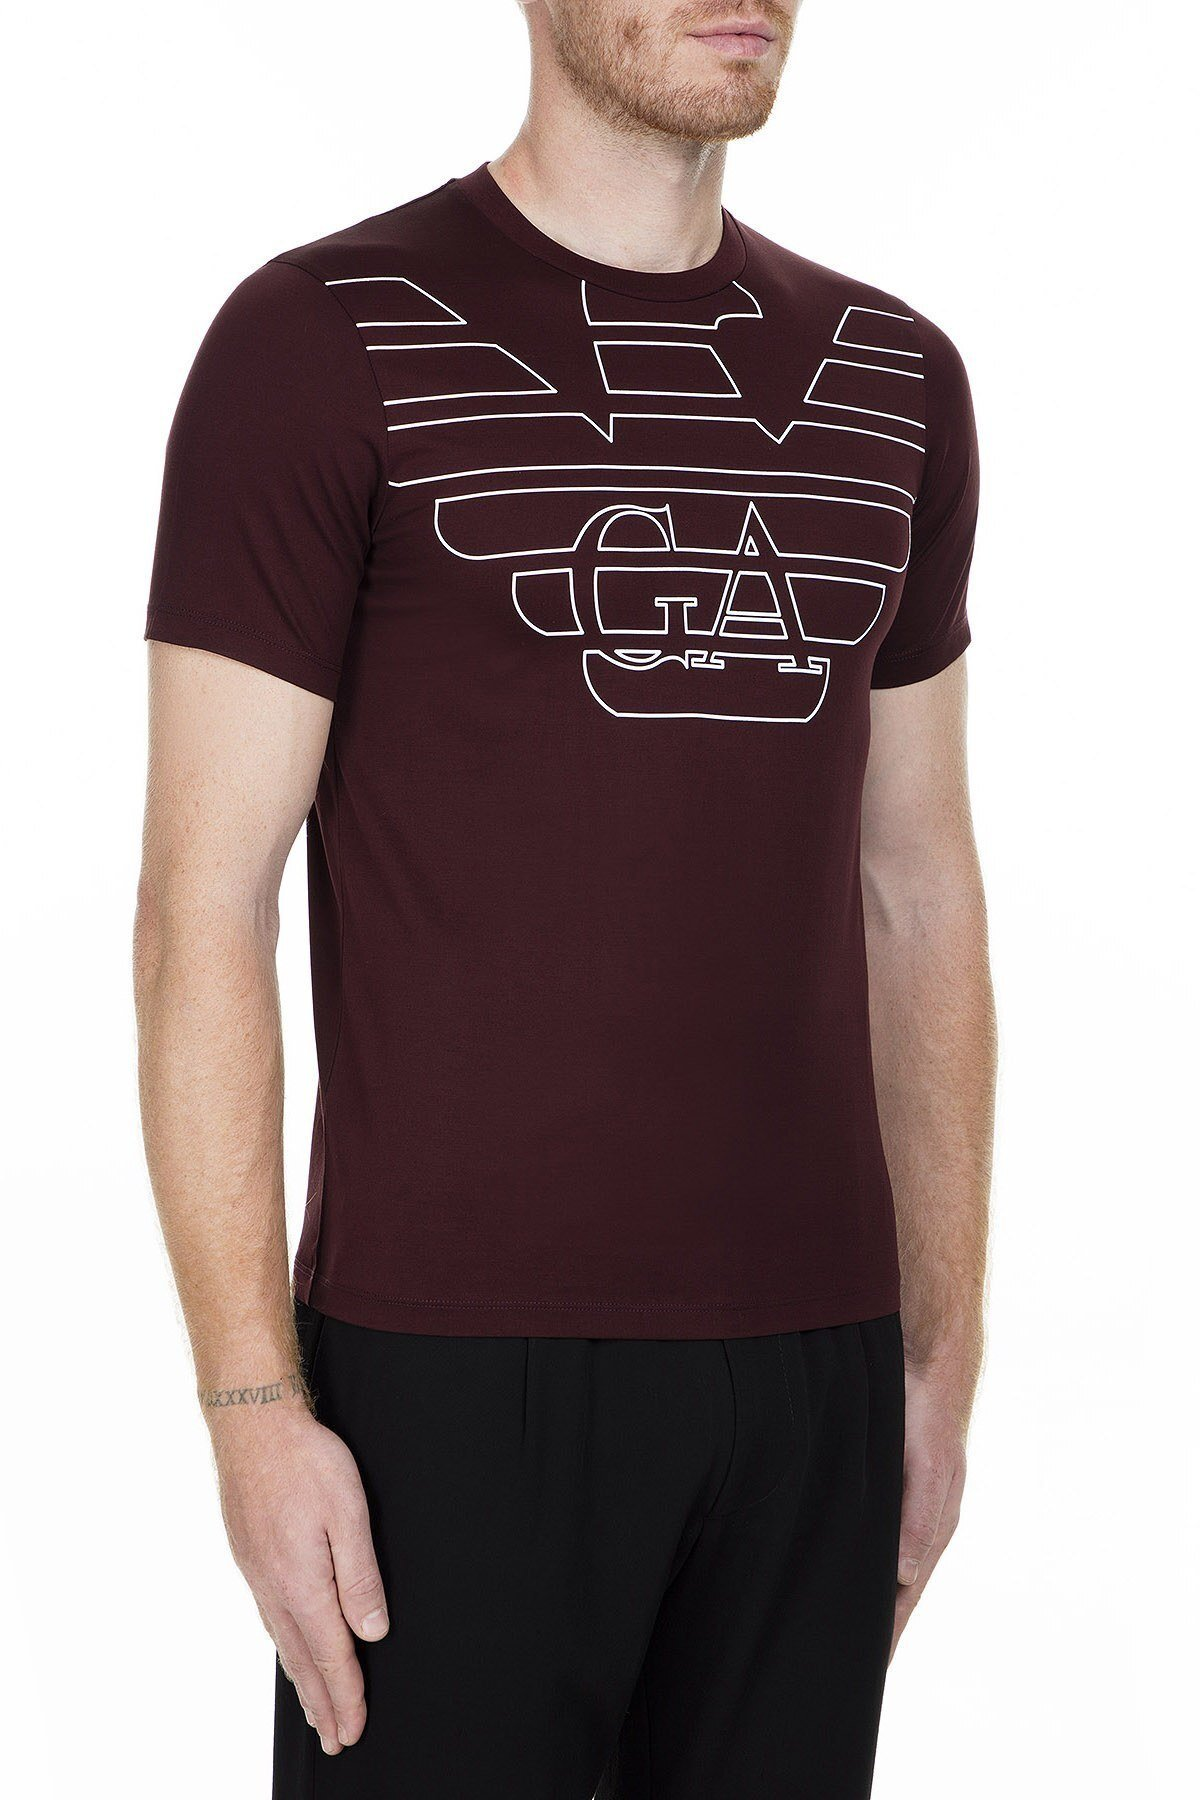 Emporio Armani Erkek T Shirt 6G1TP5 1JTUZ F332 BORDO